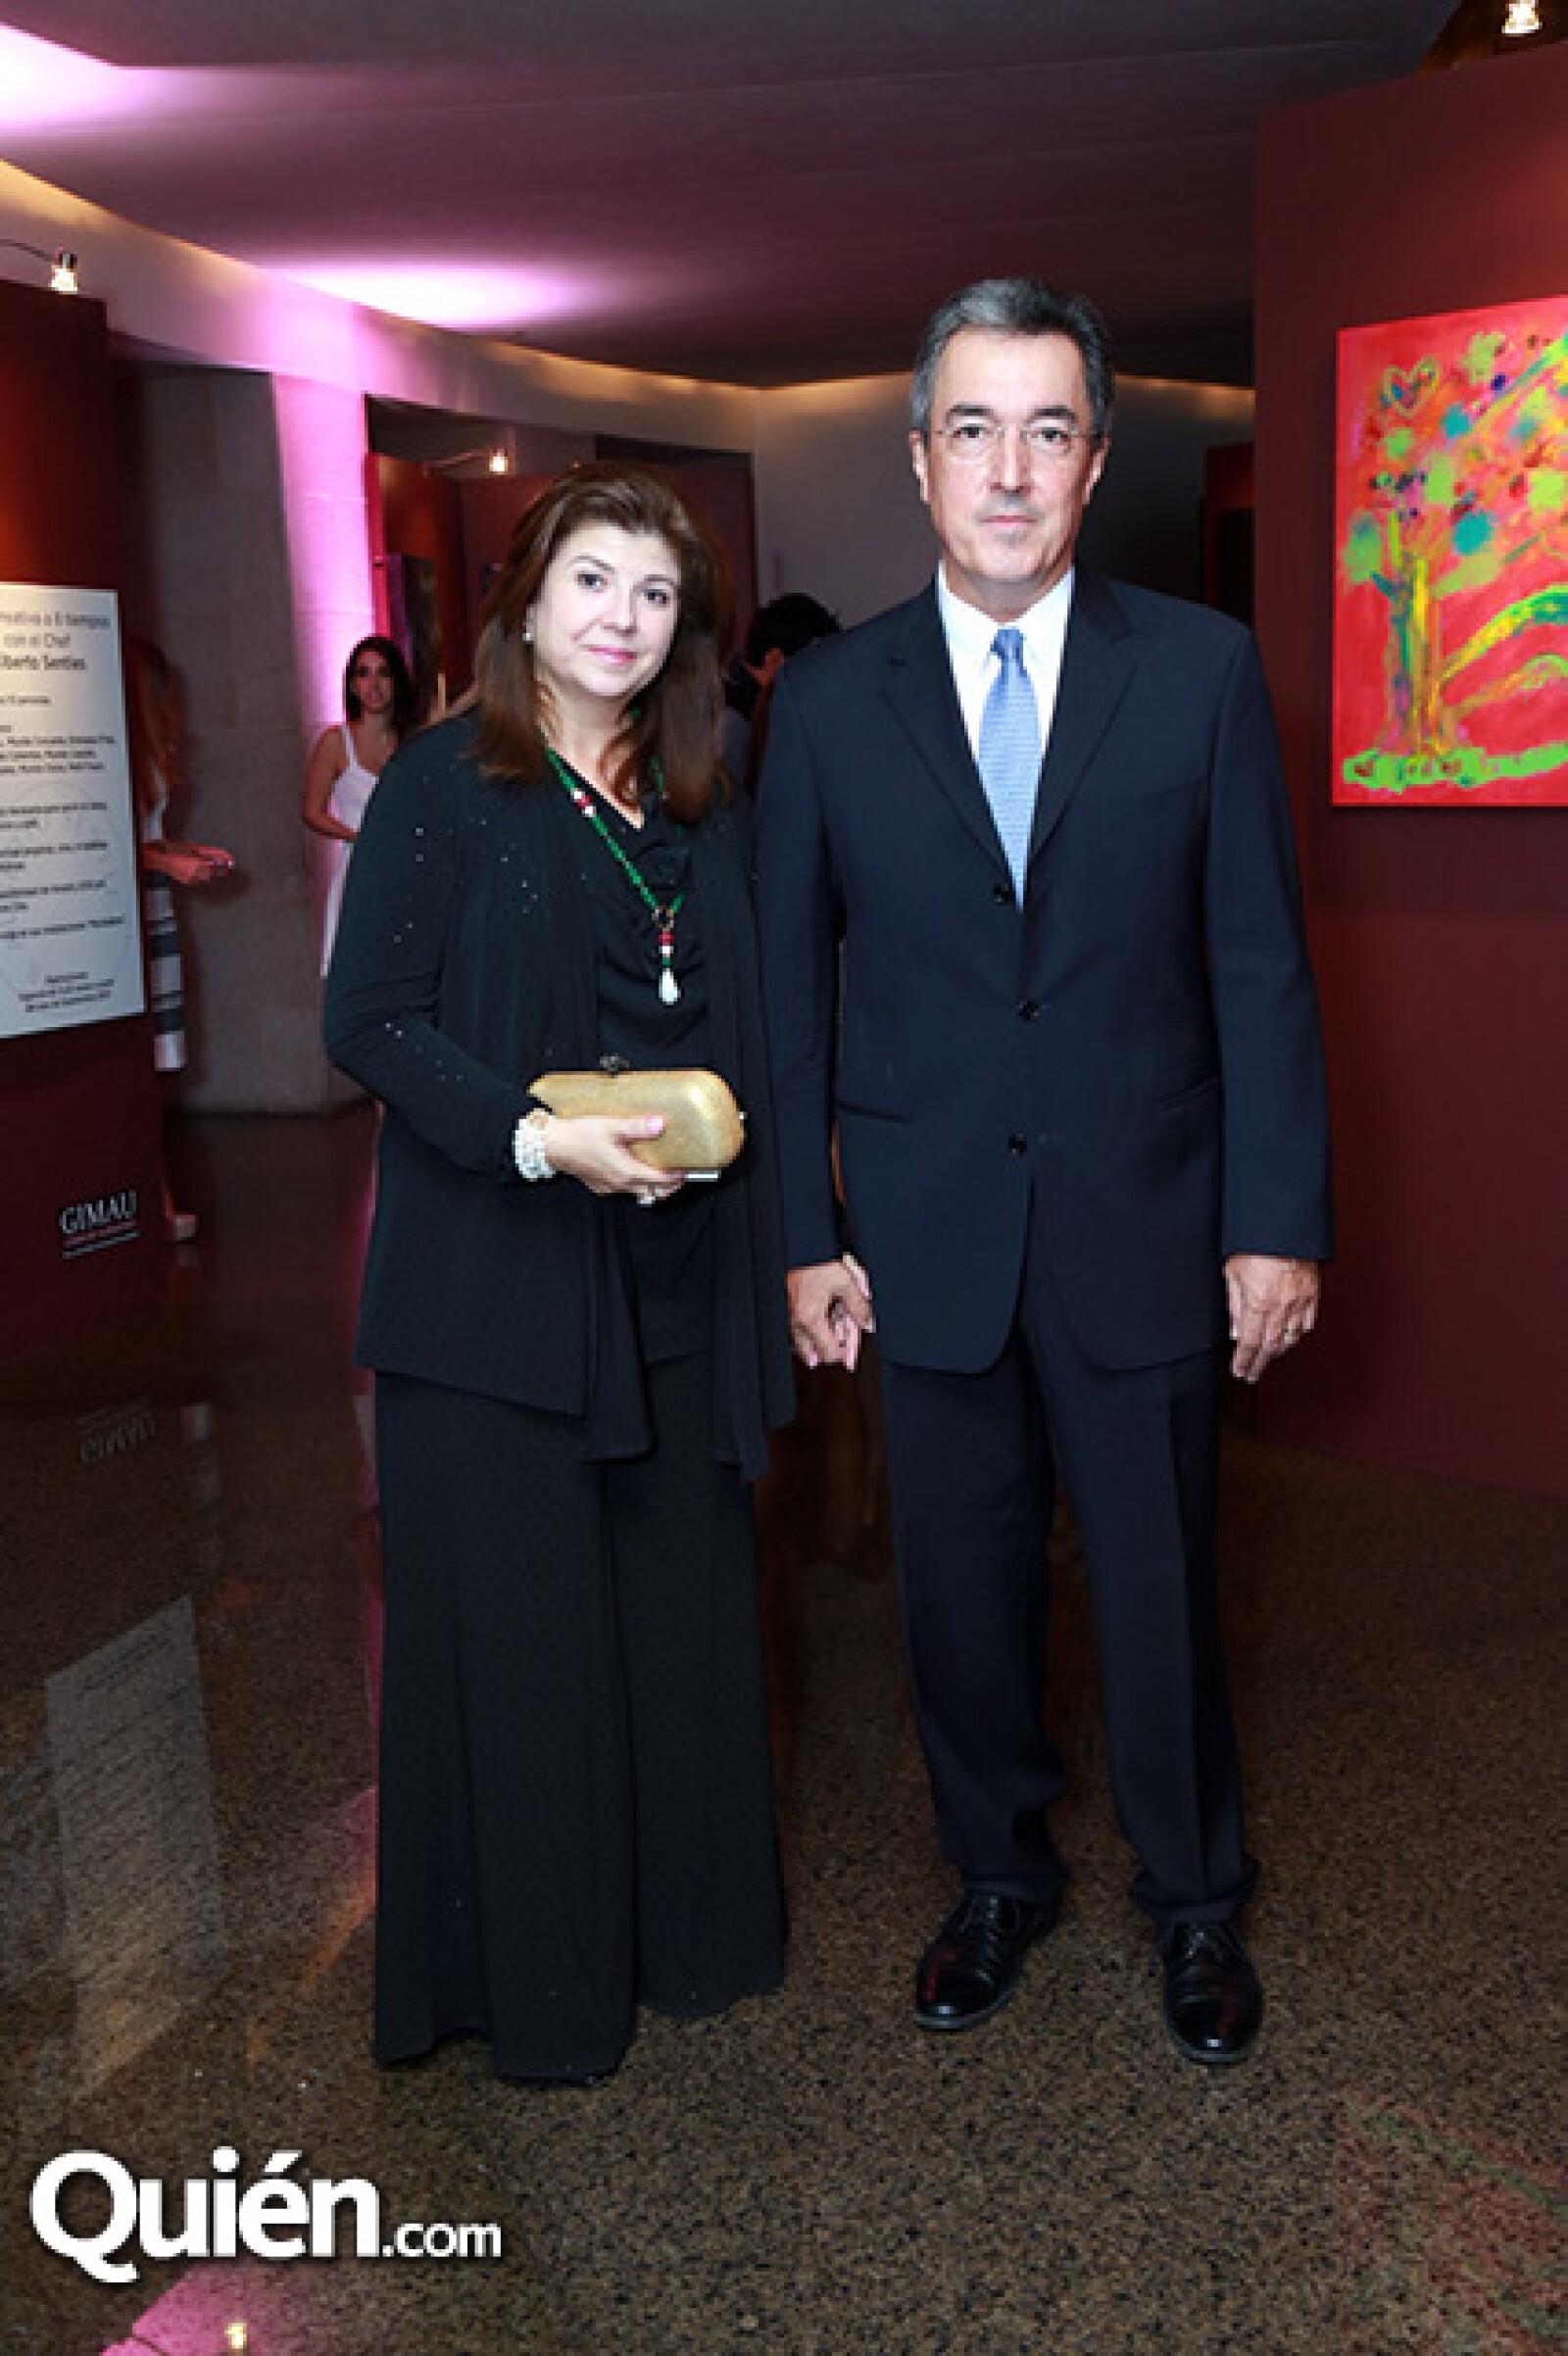 Rafael Fernández y Bulli Zubieta y Landa de Fernández